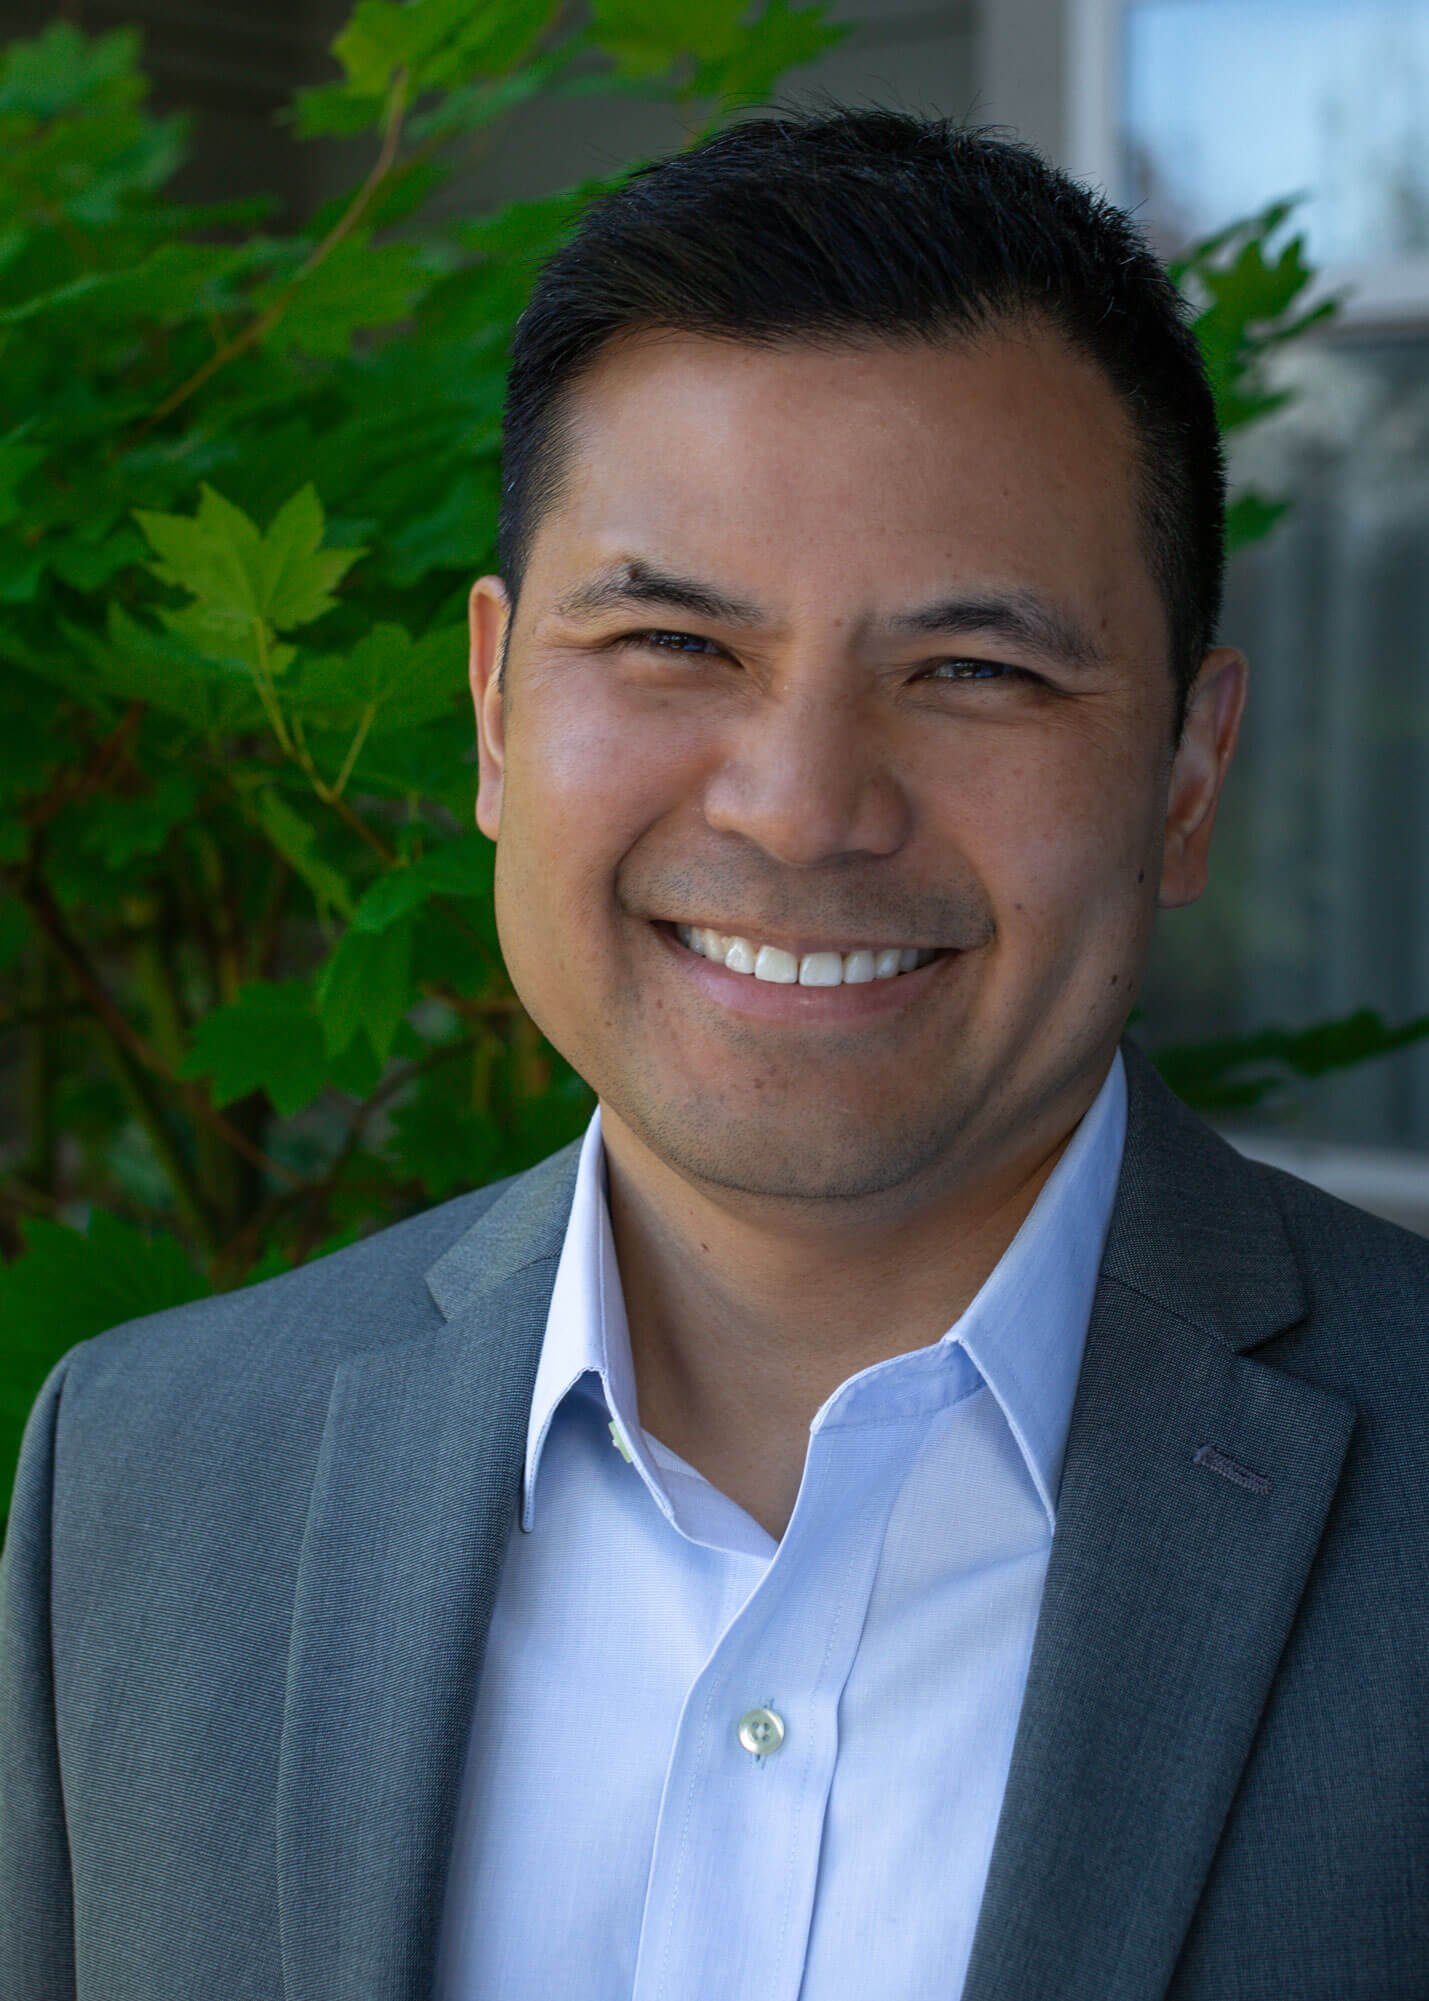 Dermatologist Oliver J. Wisco, DO, FAAD, FACMS